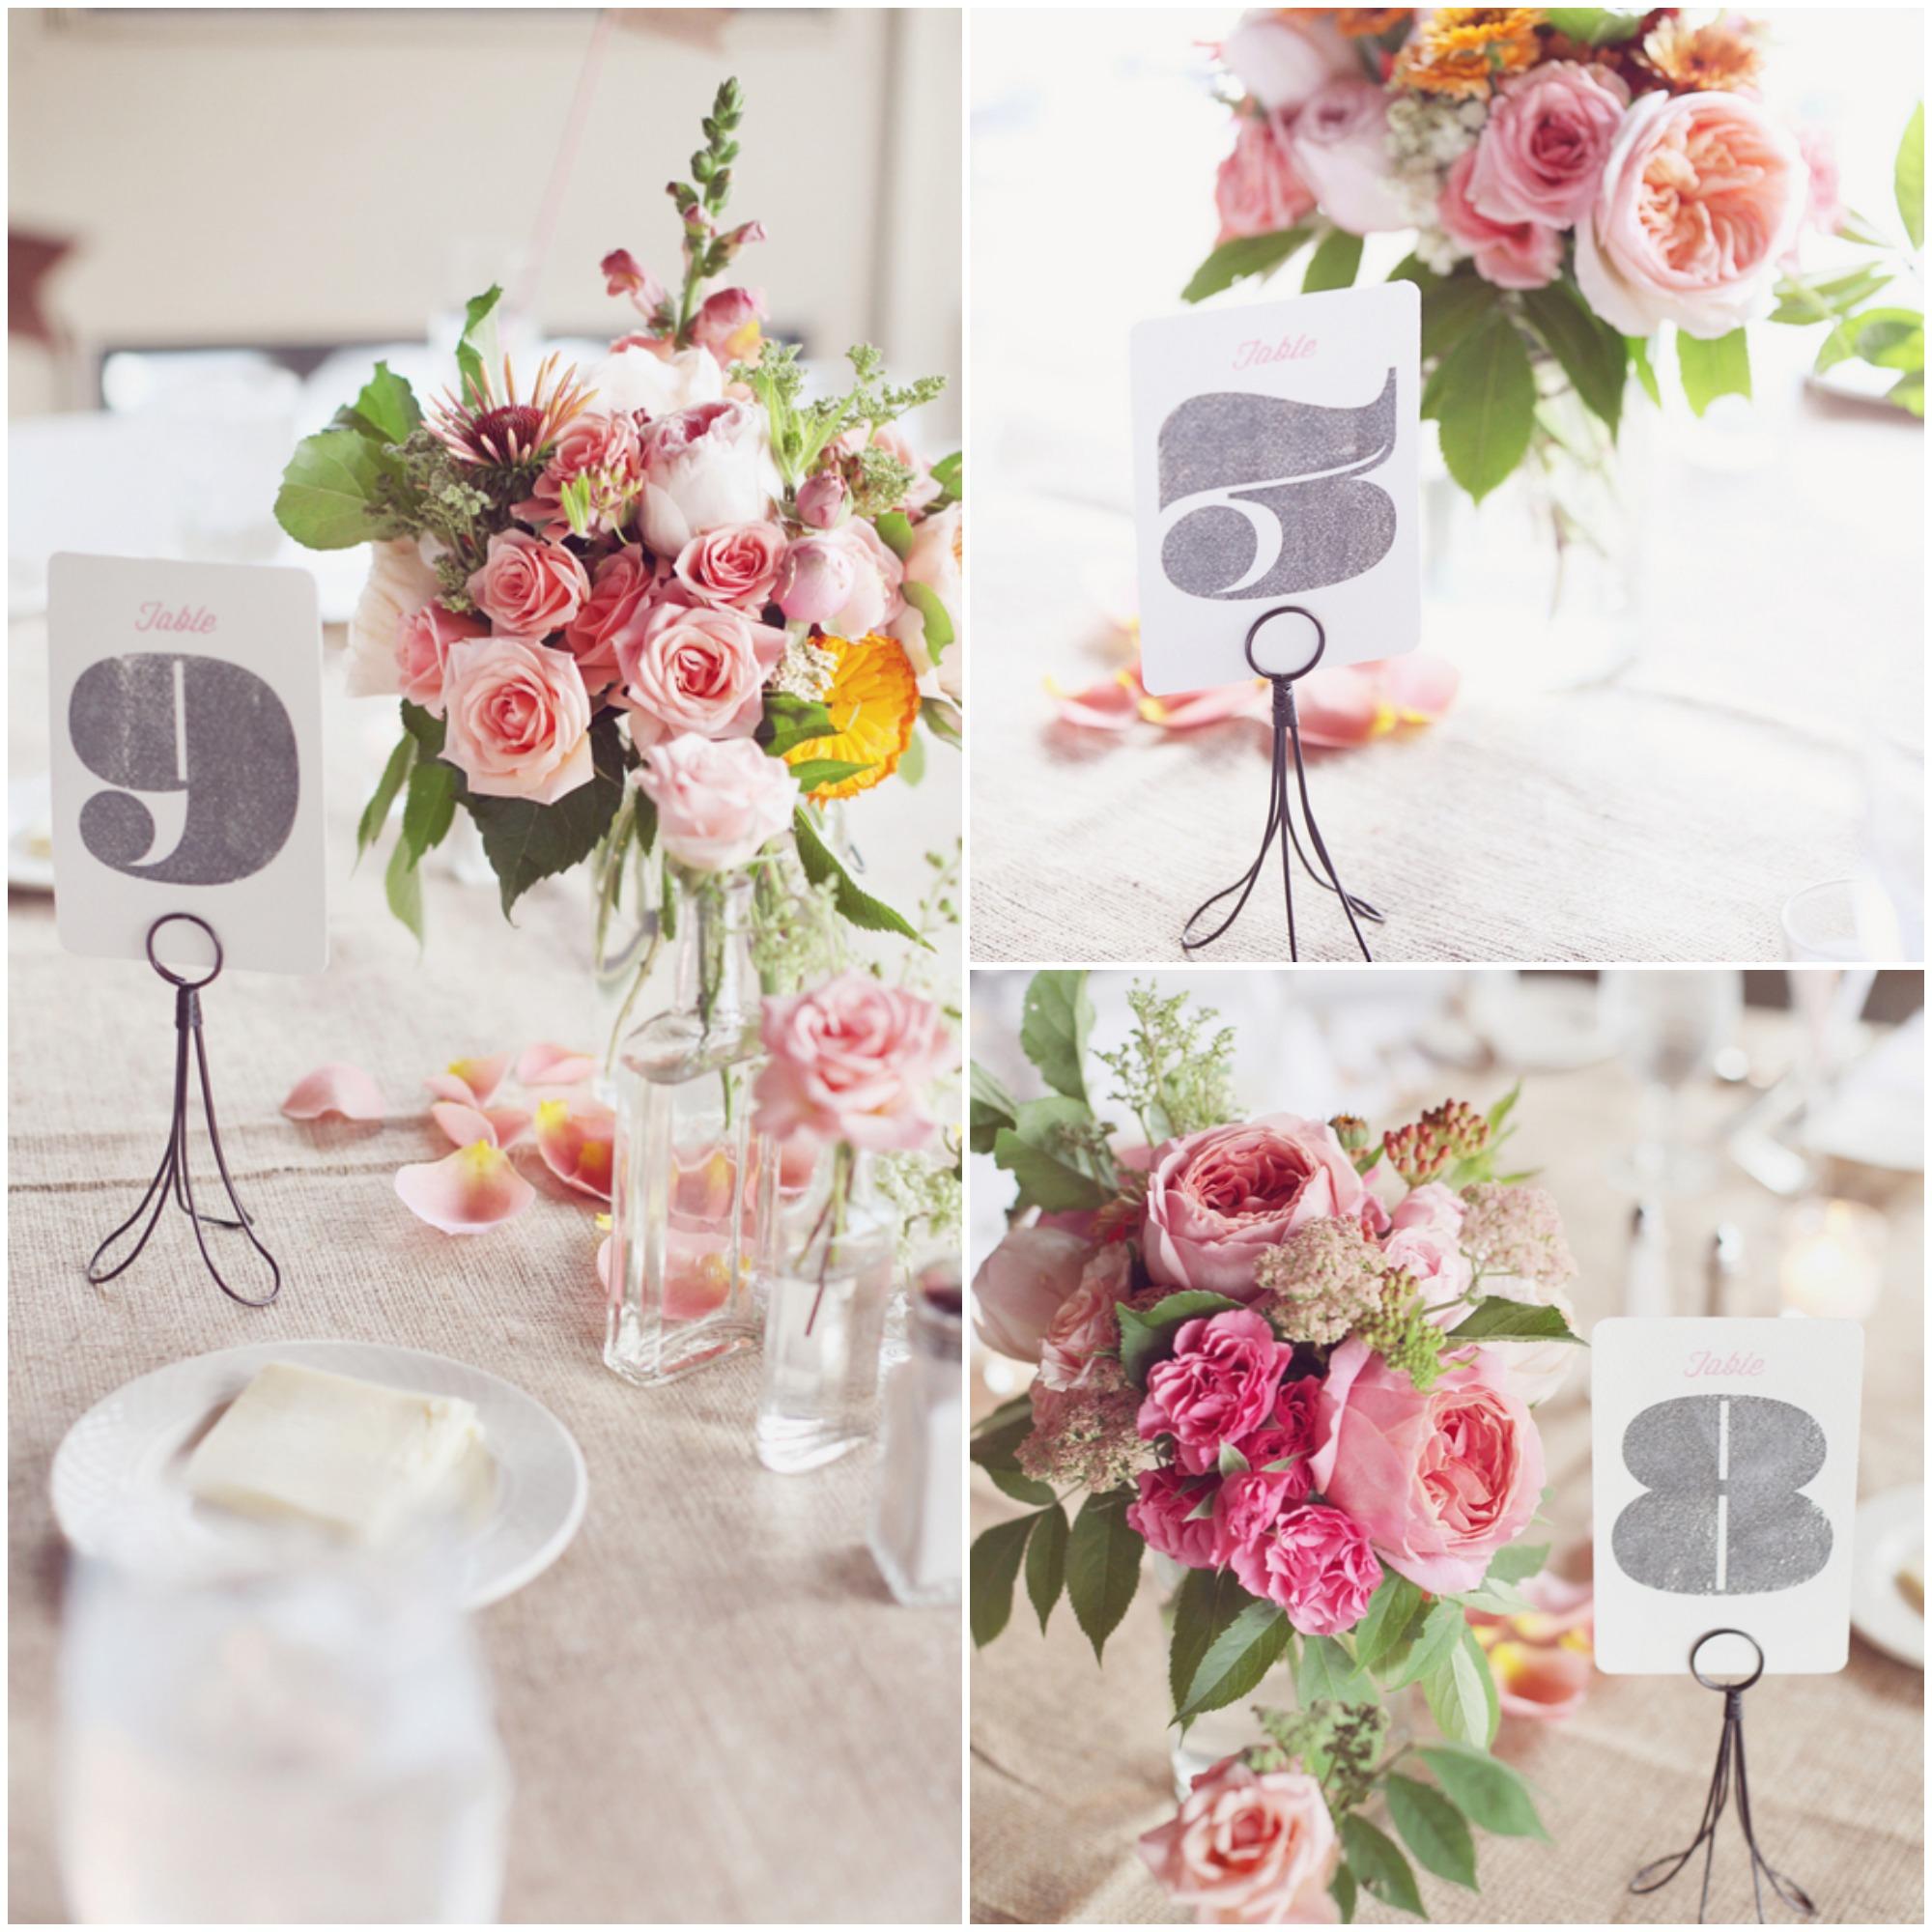 Vermont Wedding Flowers: Vermont Green Mountain Wedding Equinox Resort- Rustic